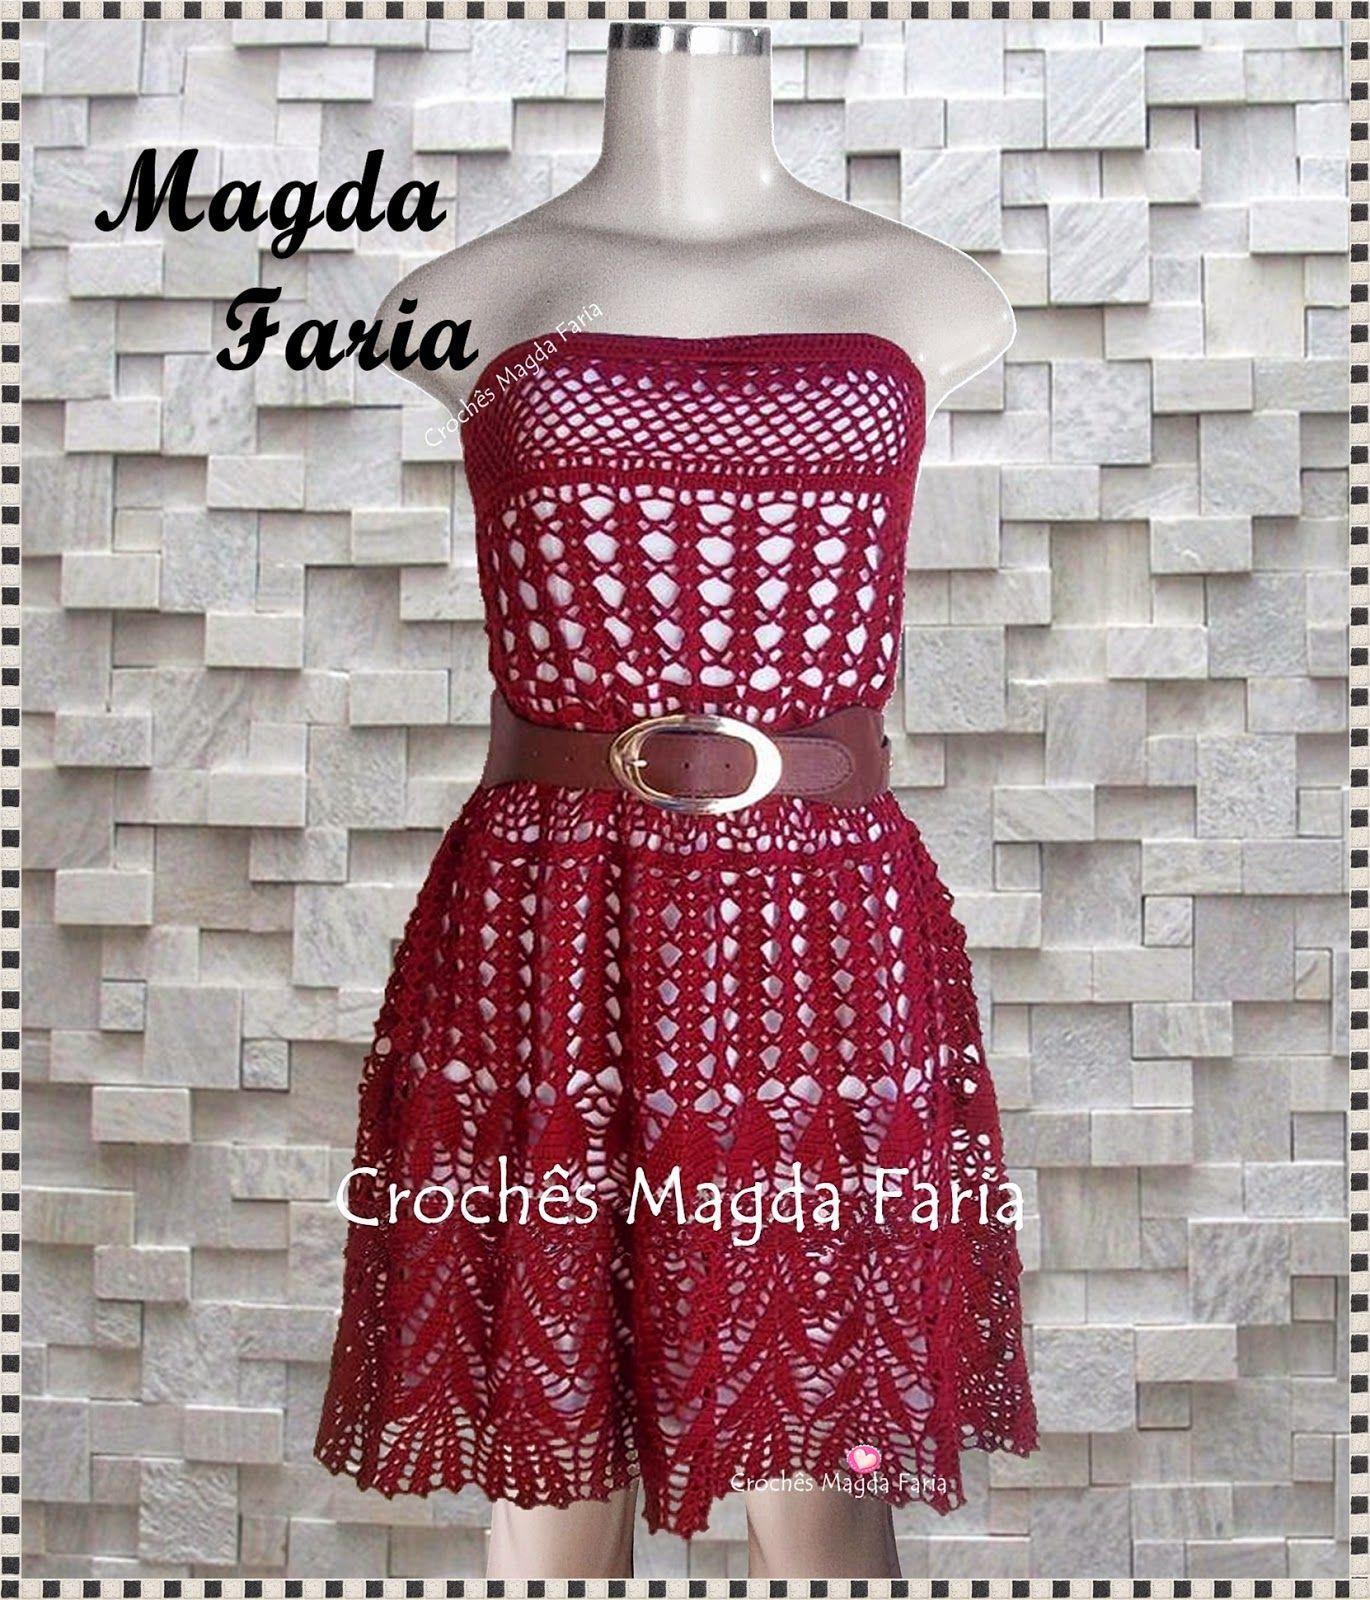 Famosos Crochê Magda Faria: Vestido Mariá | Crochê Vestidos | Pinterest  BZ59